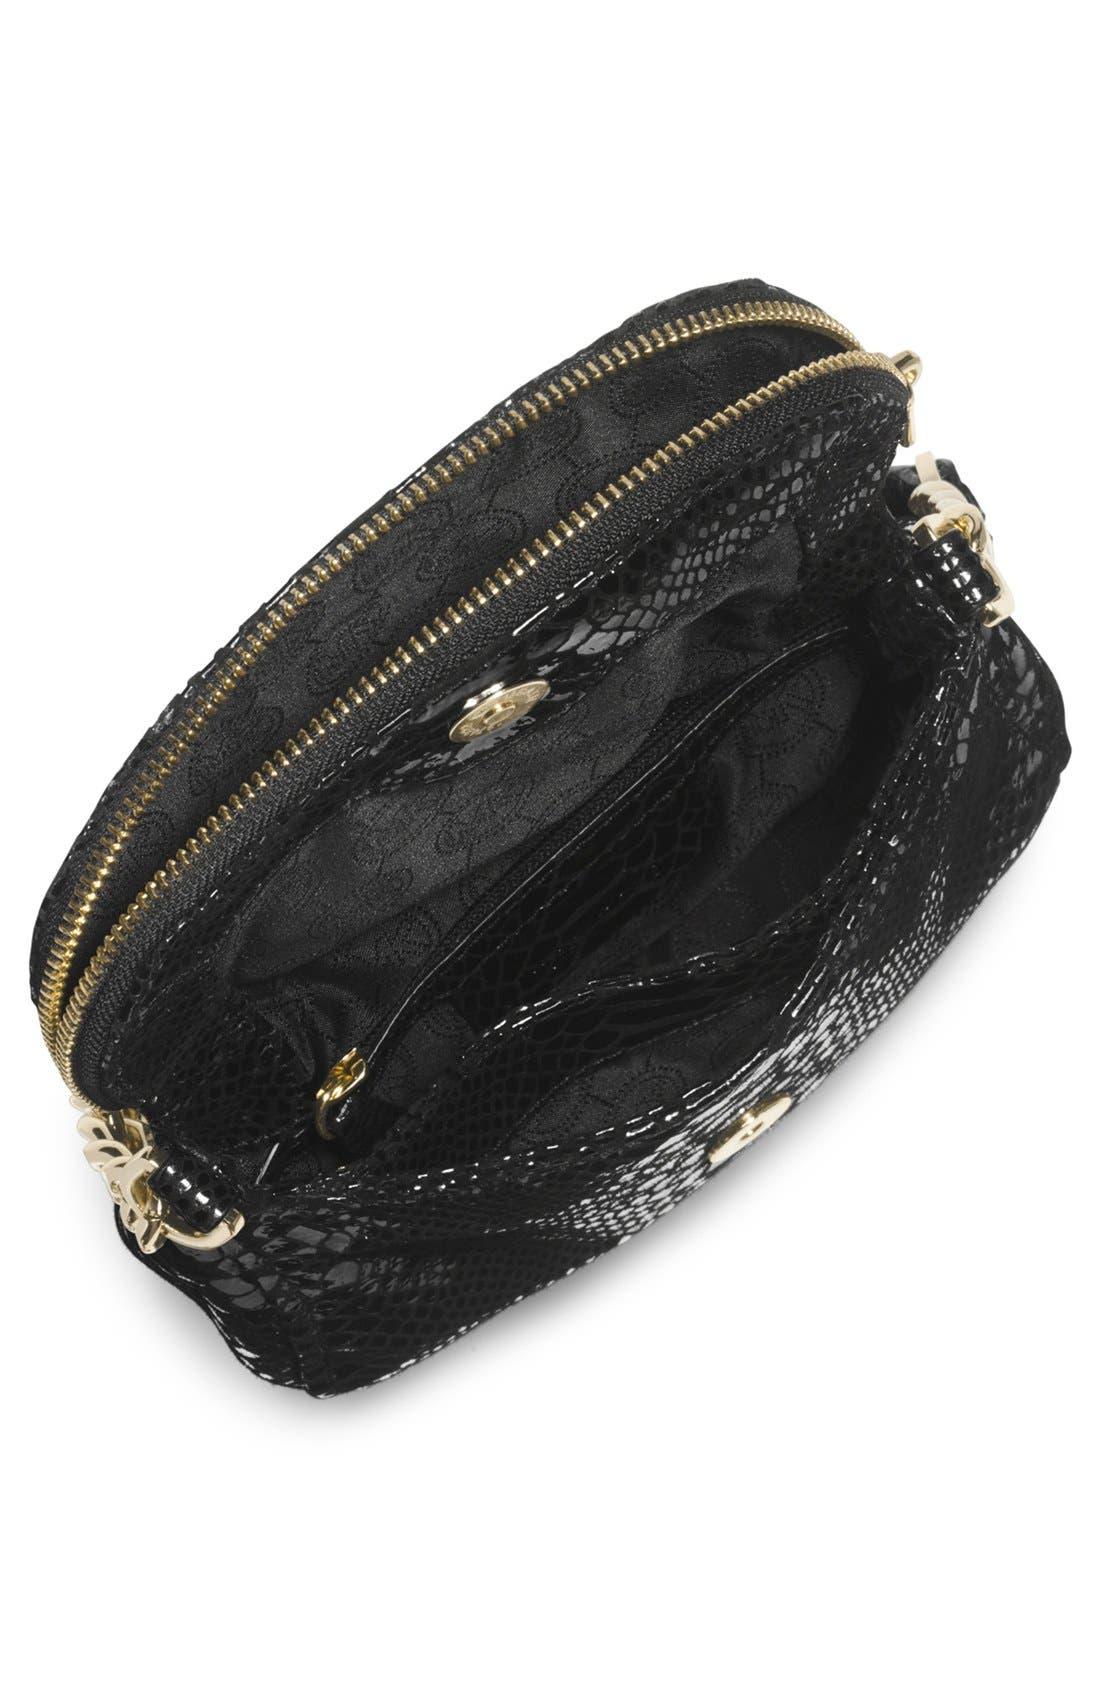 Alternate Image 2  - MICHAEL Michael Kors 'Bedford' Python Embossed Leather Crossbody Bag